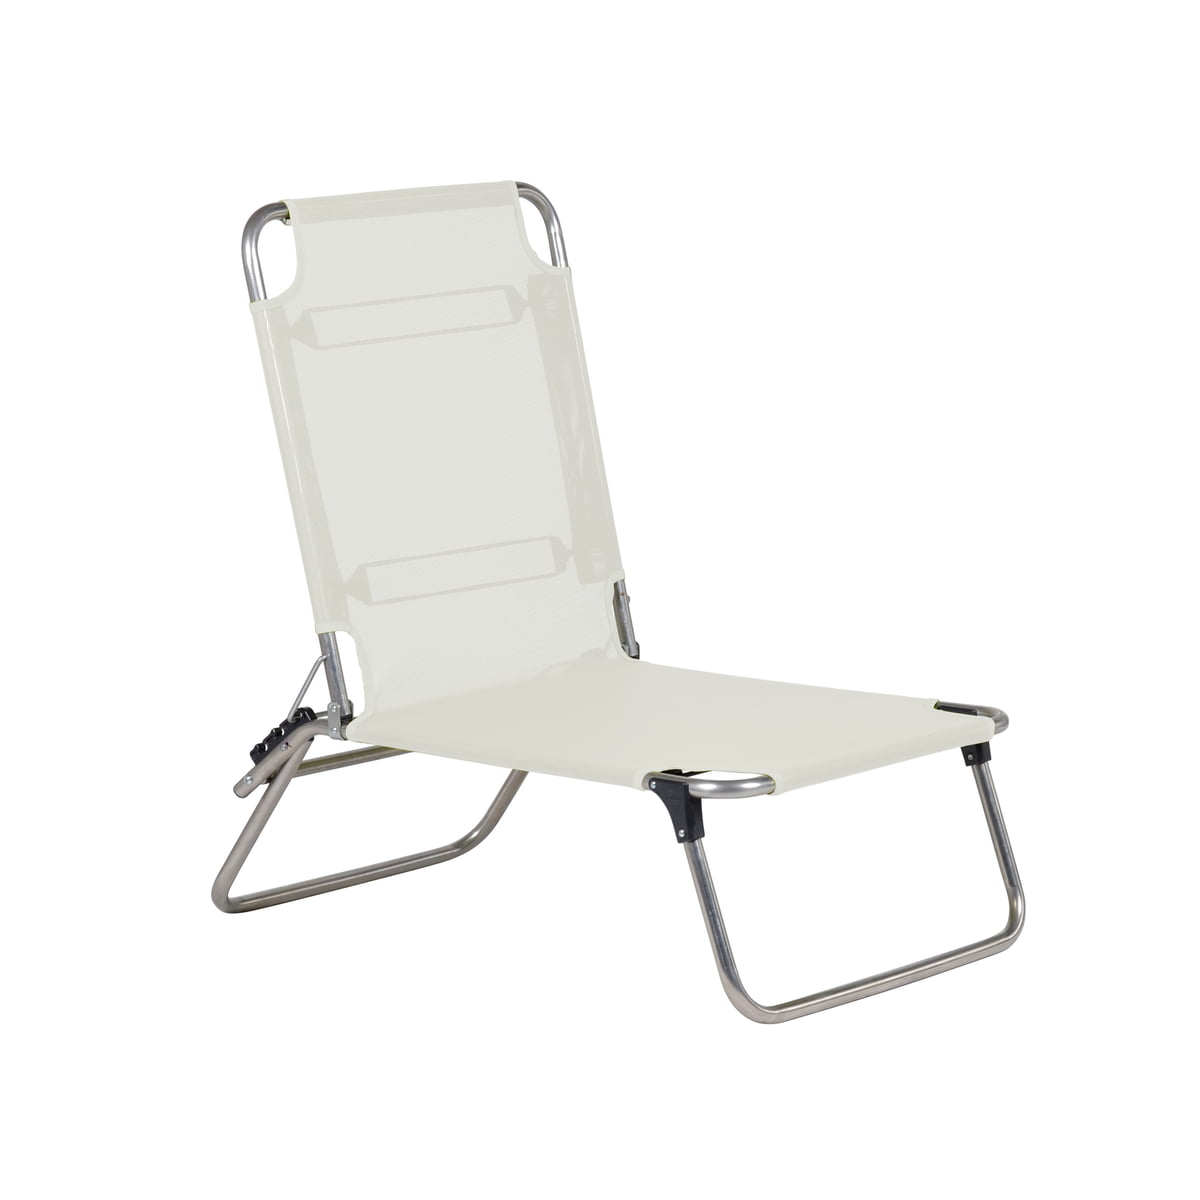 Piccolina Beach Folding Chair By Fiam